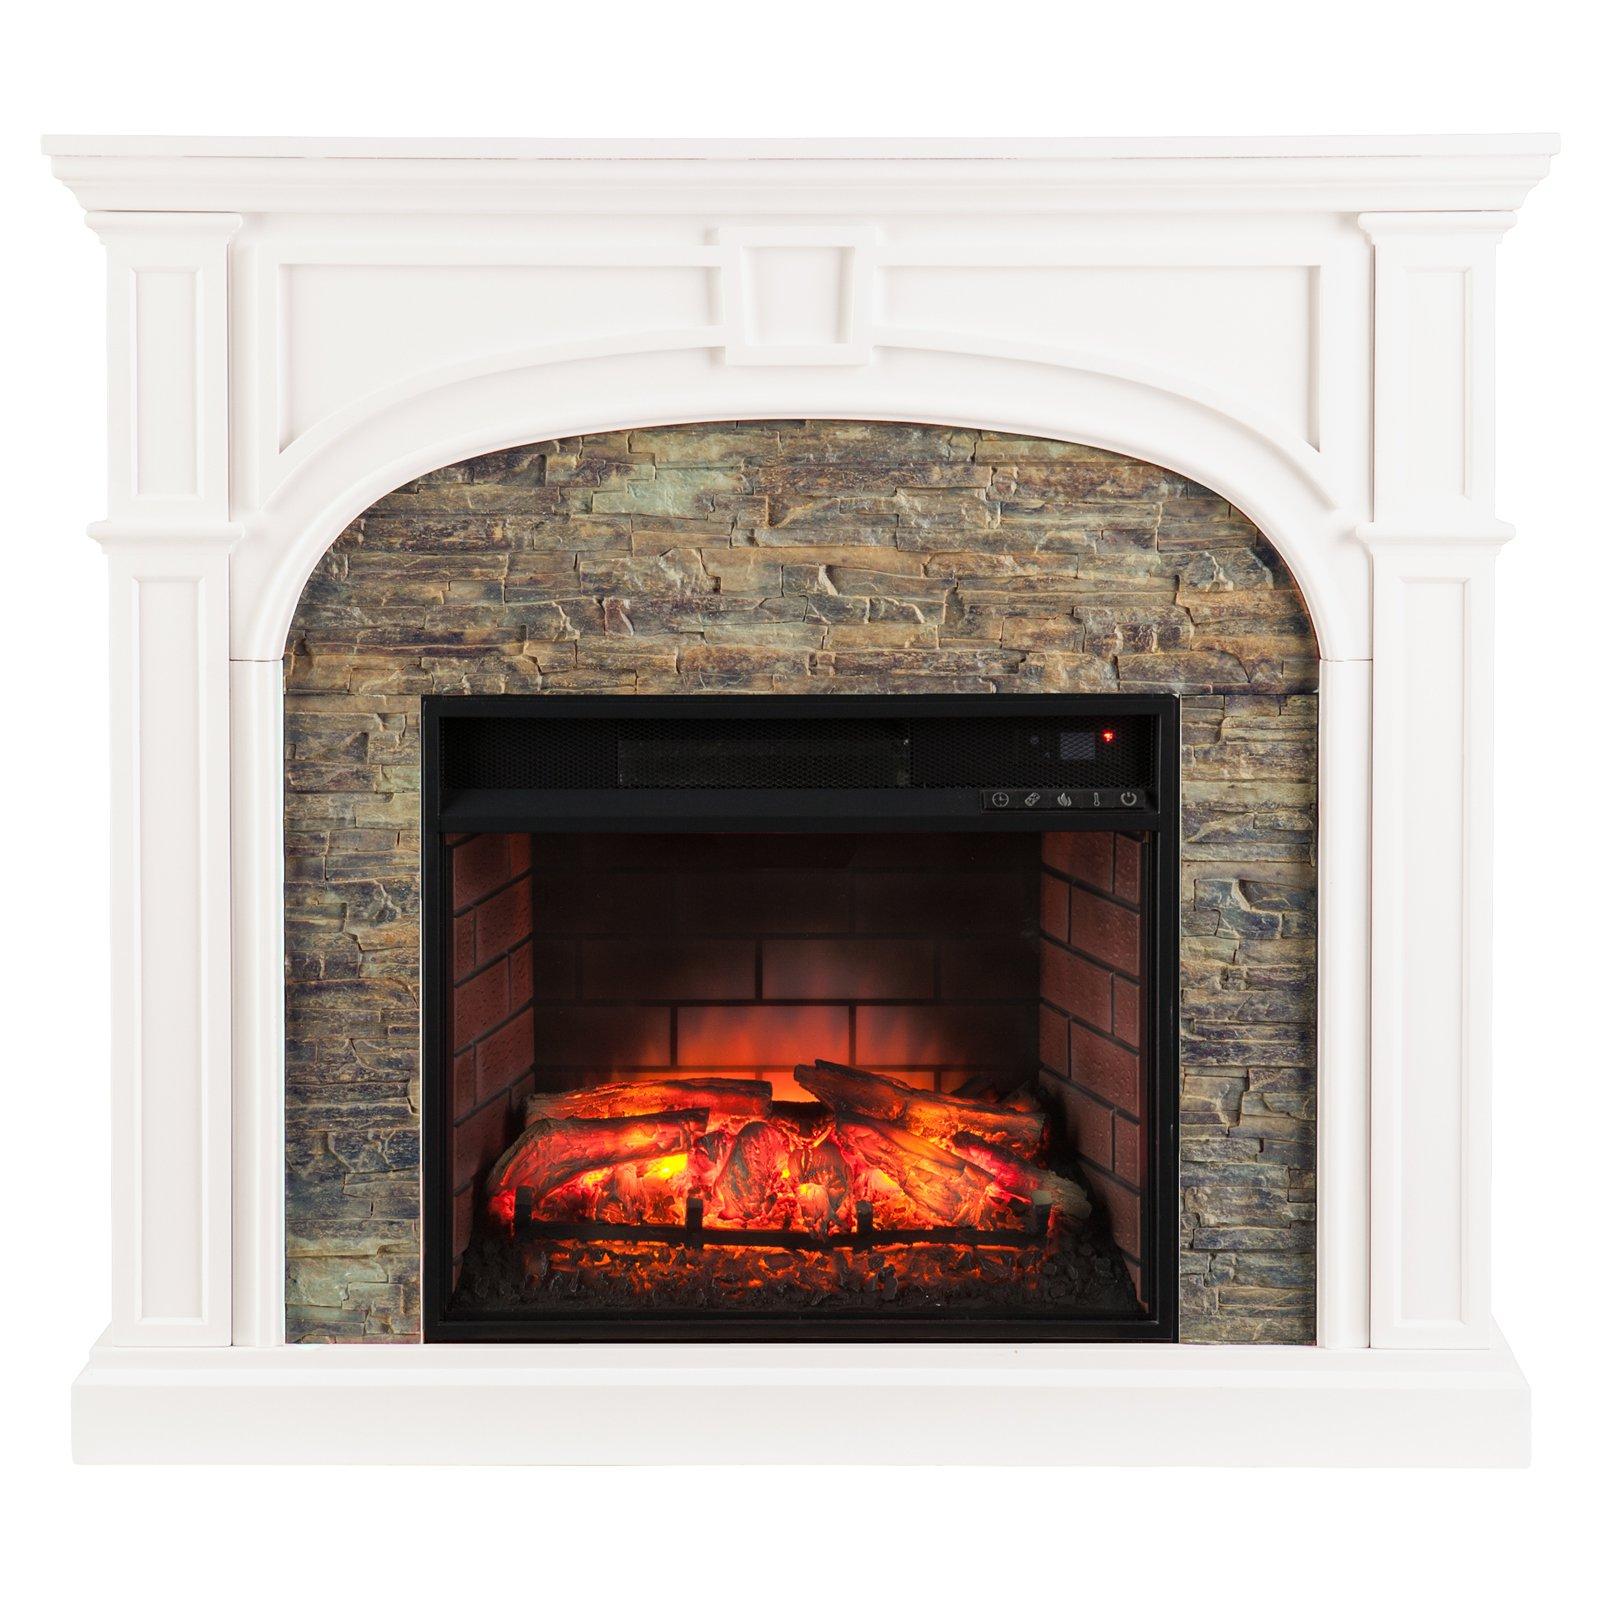 Southern Enterprises Tanaya Infrared Electric Media Fireplace